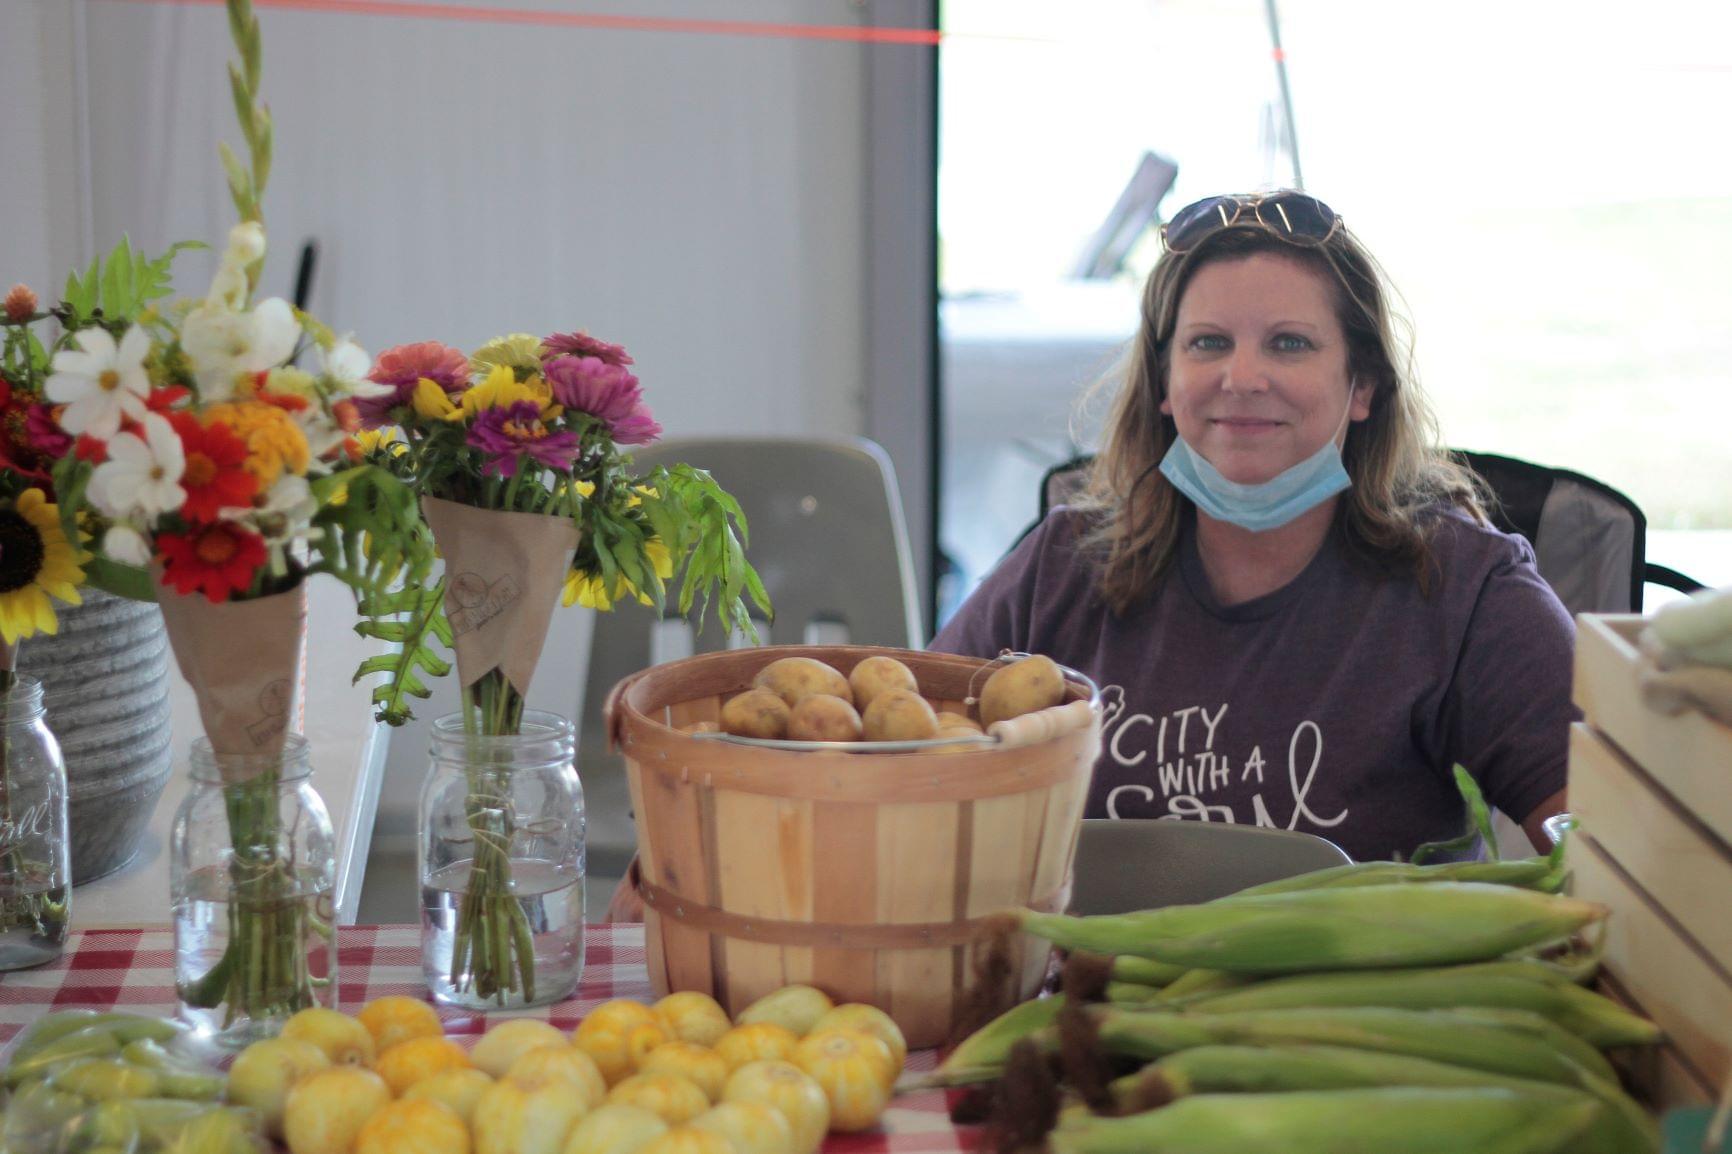 Farmers Market Season Heats Up (PHOTO GALLERY)